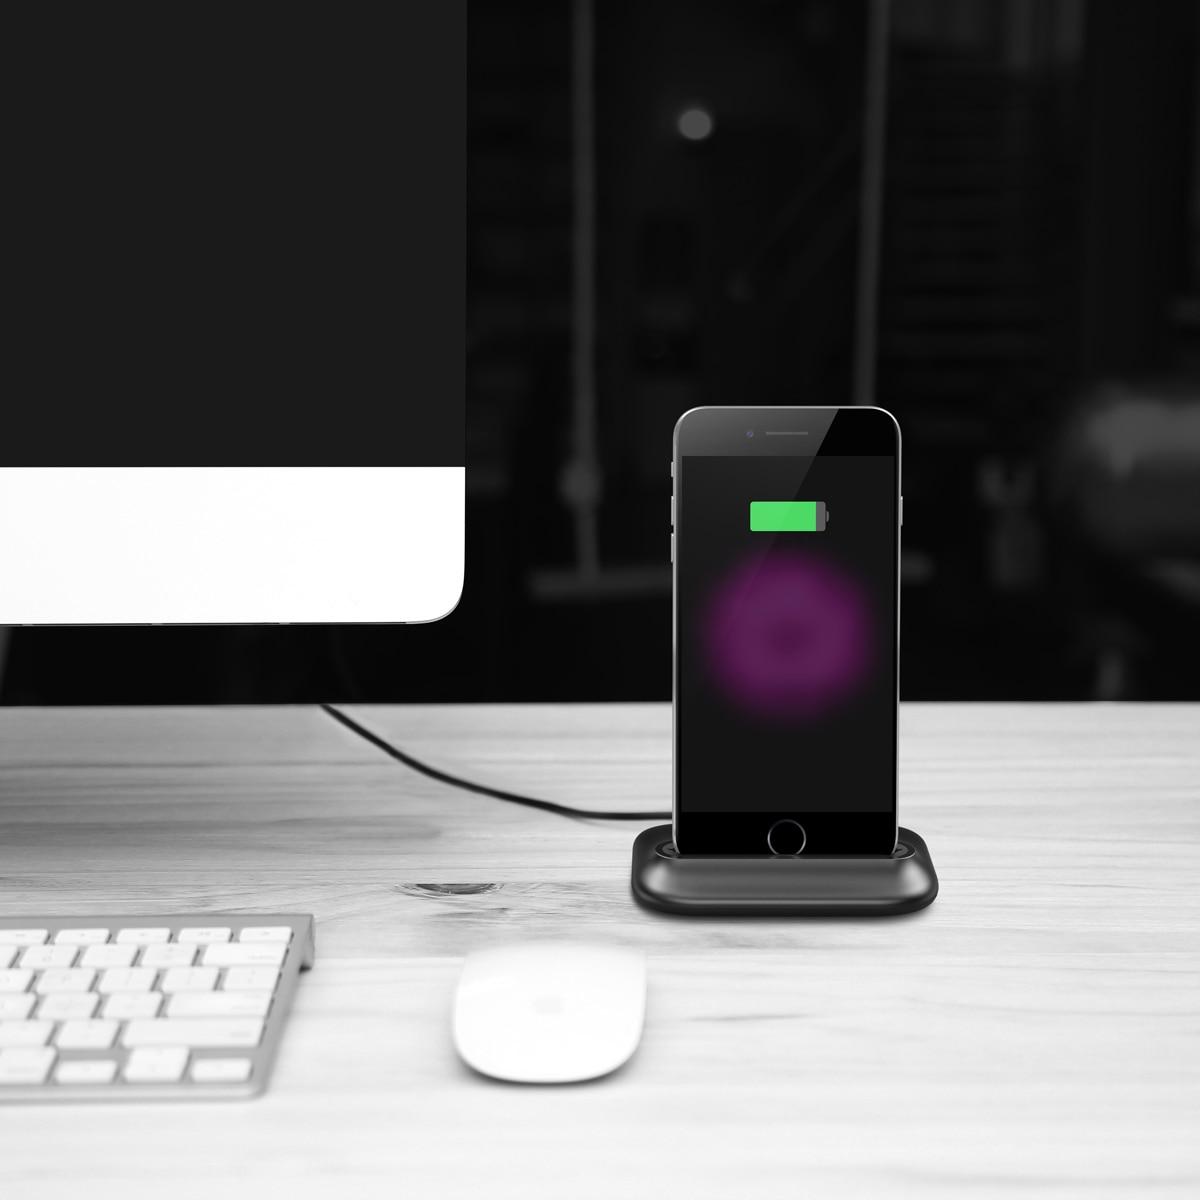 windygirl store rakuten item holder en desk global both stand tablet iphone ipad smartphone h market for